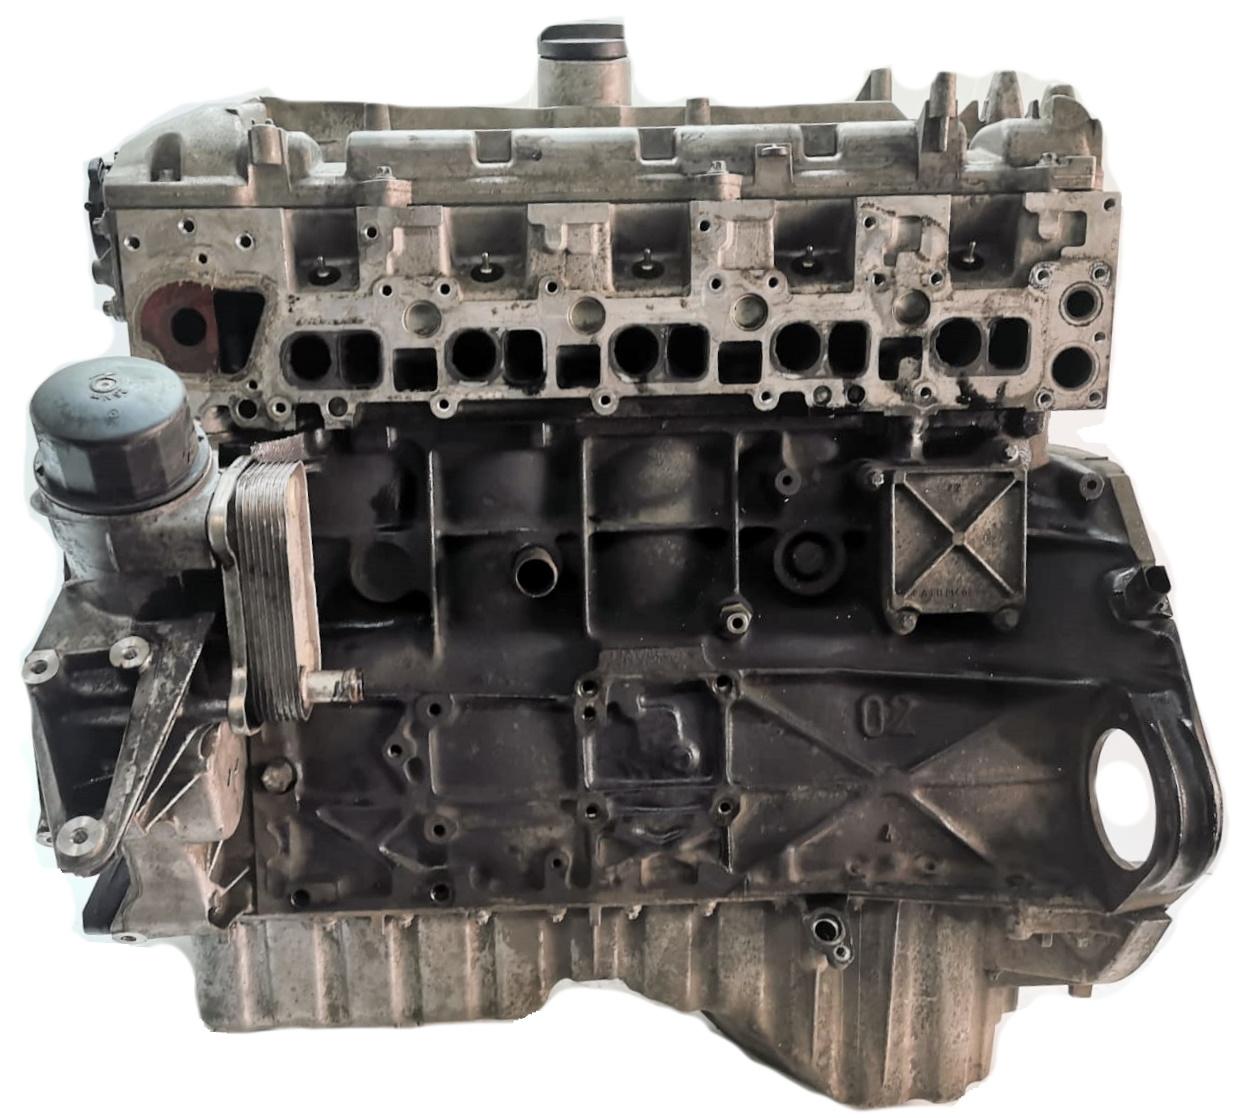 Motor 2003 Mercedes Benz E-Klasse W210 VF210 S210 2,7 CDI OM612 612.961